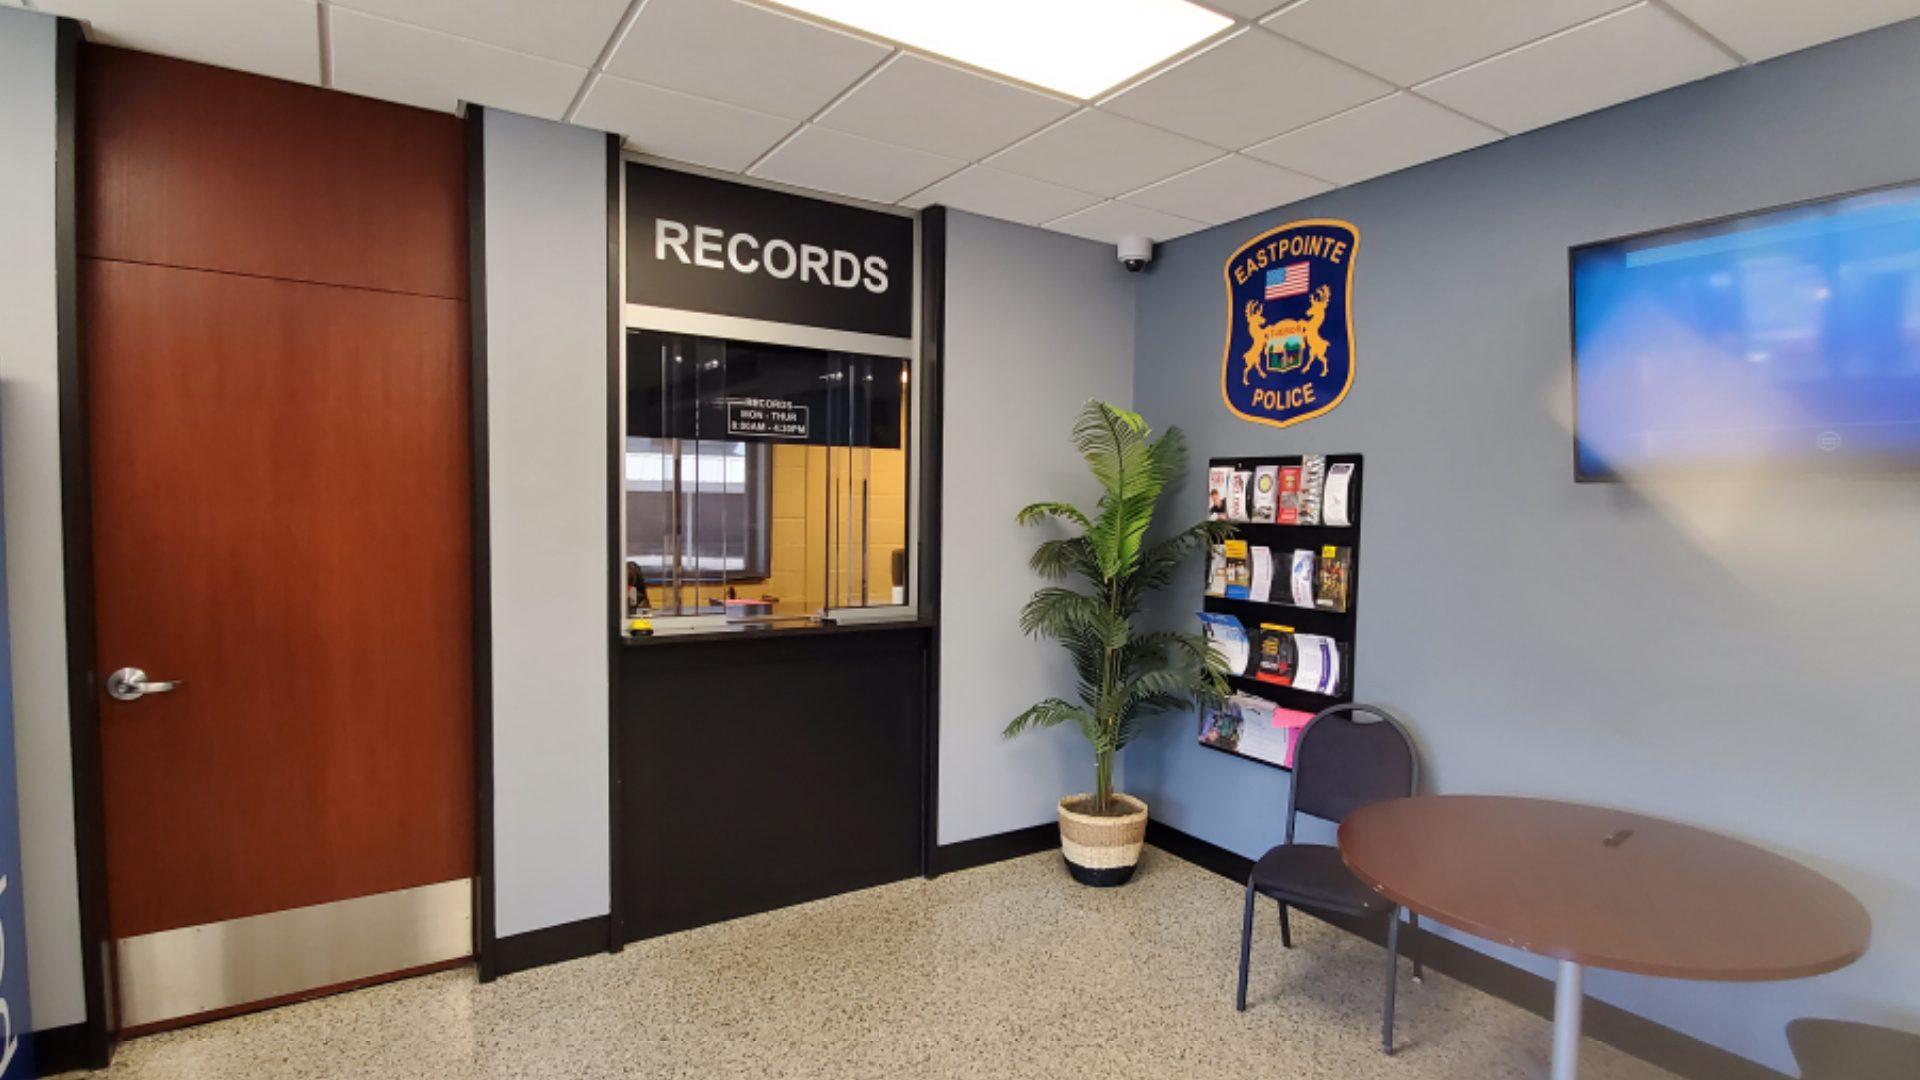 Eastpointe Police - Lobby Signage (5)